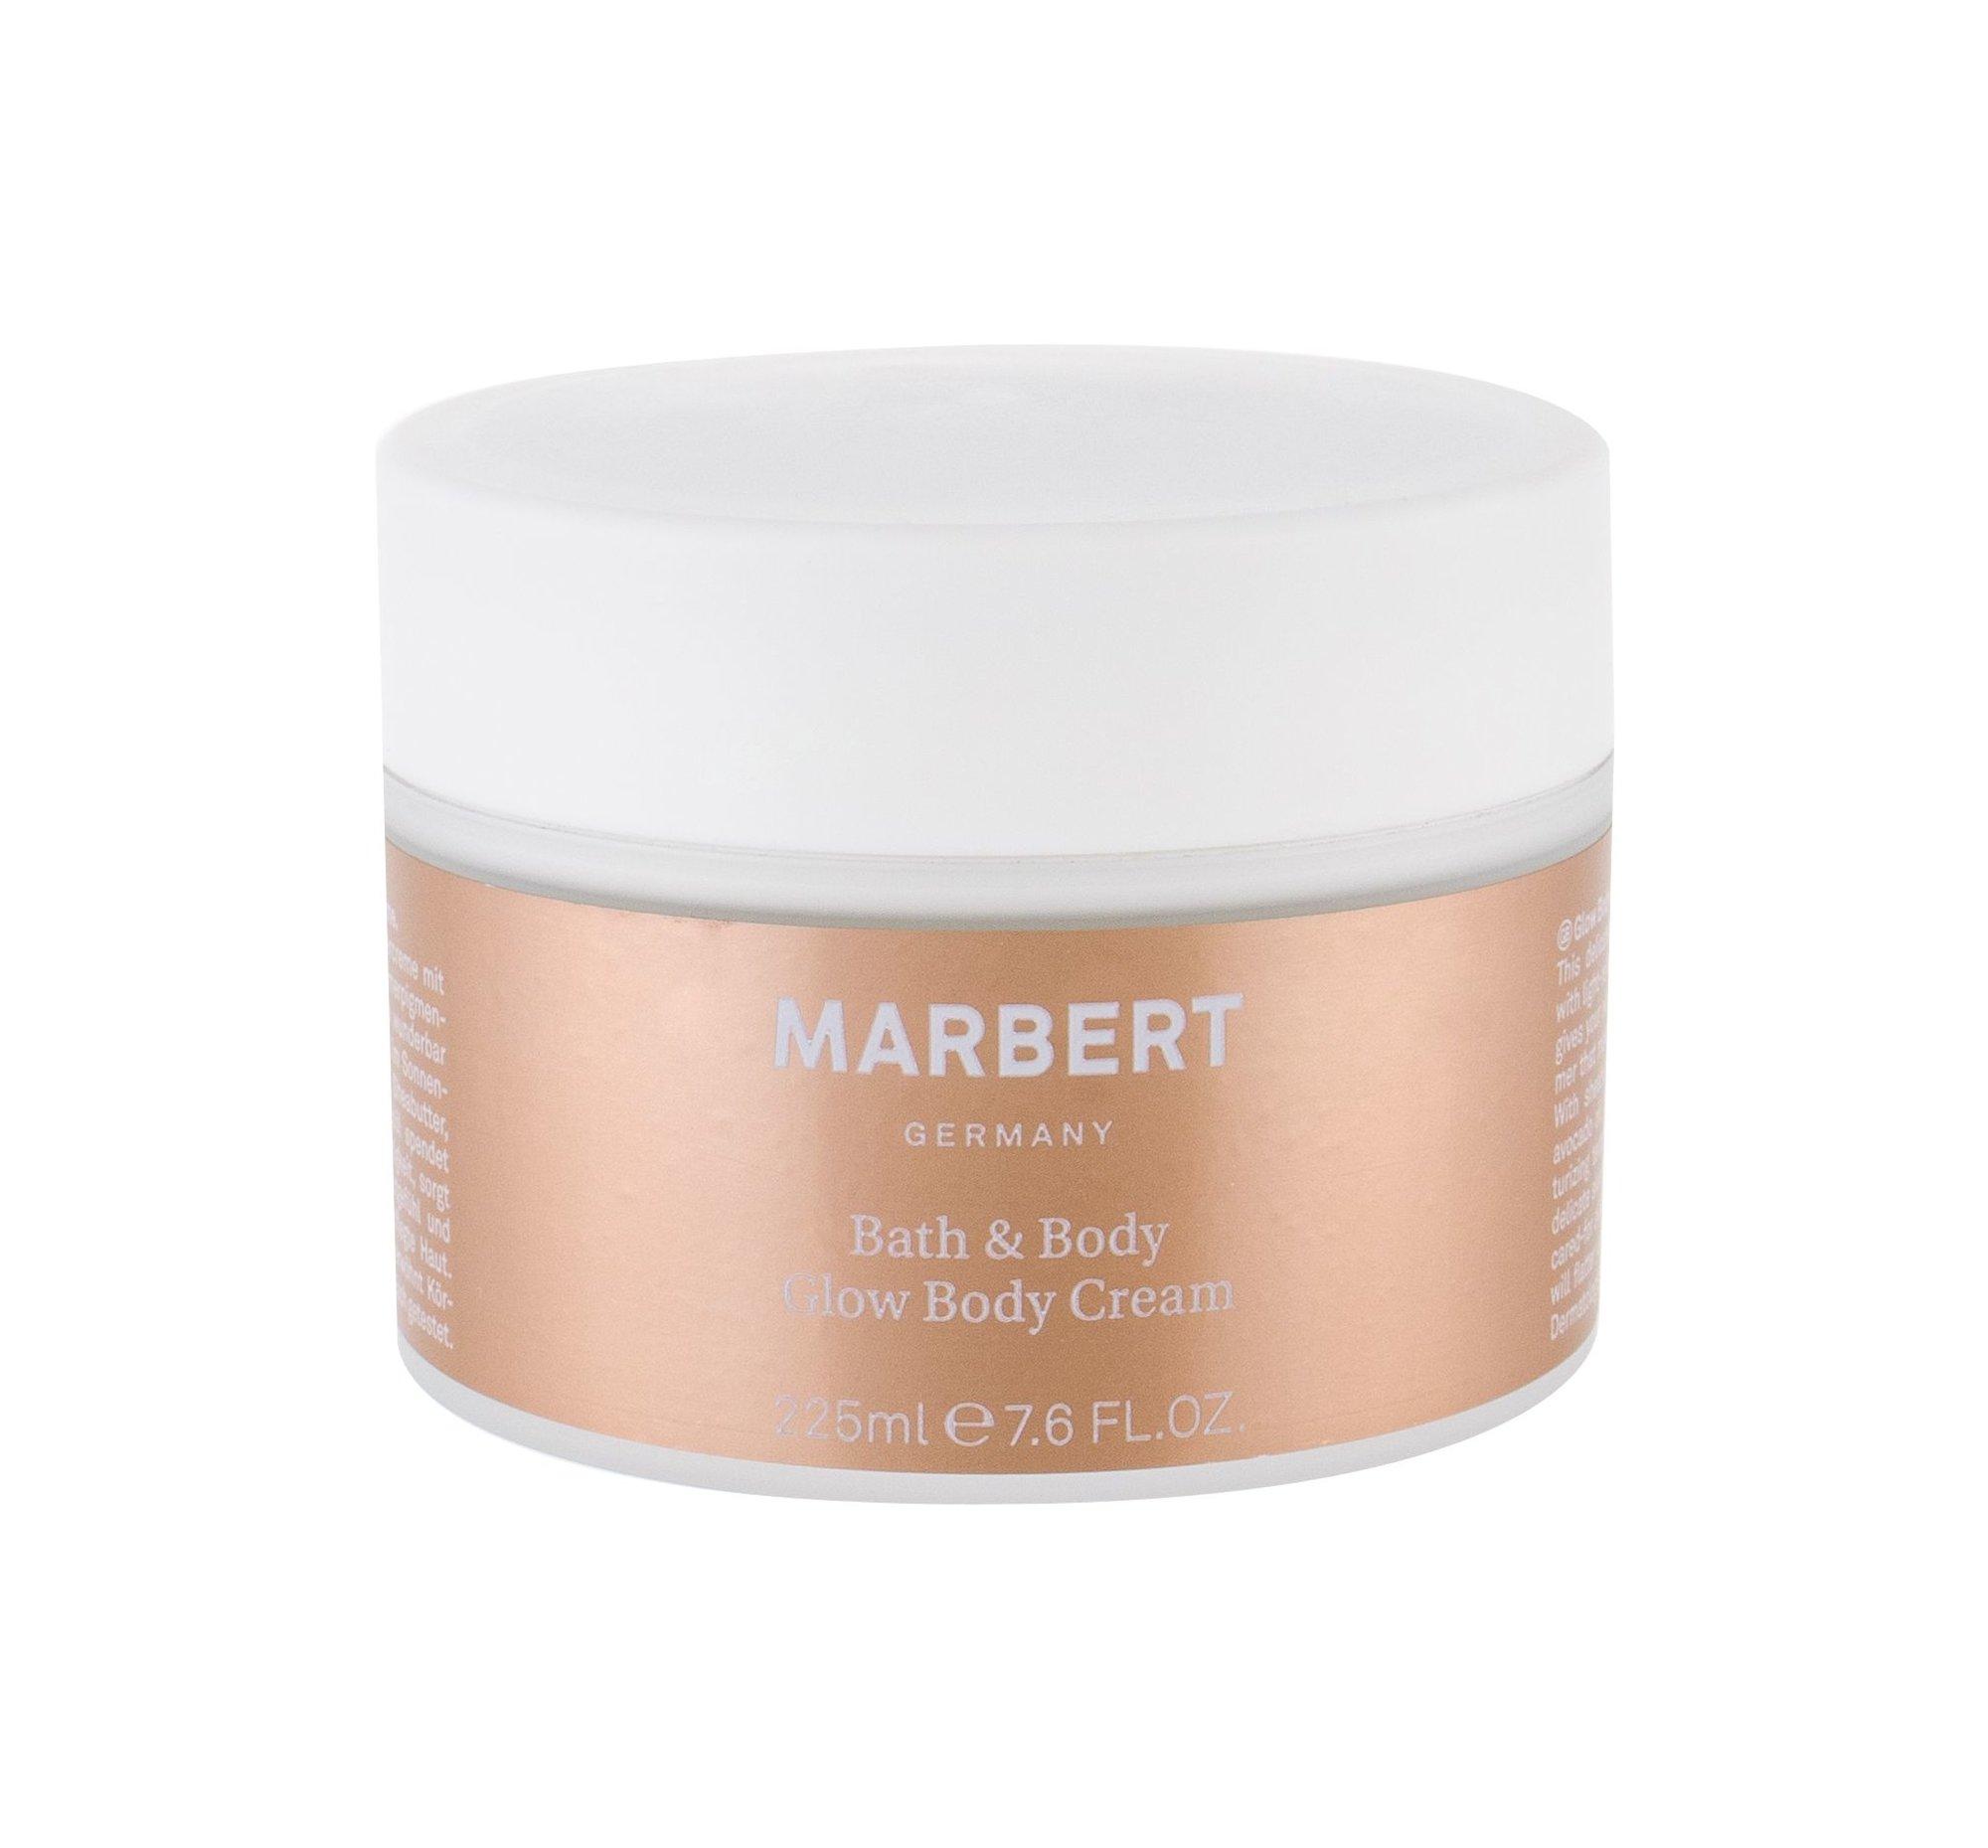 Marbert Bath & Body Glow Body Cream 225ml